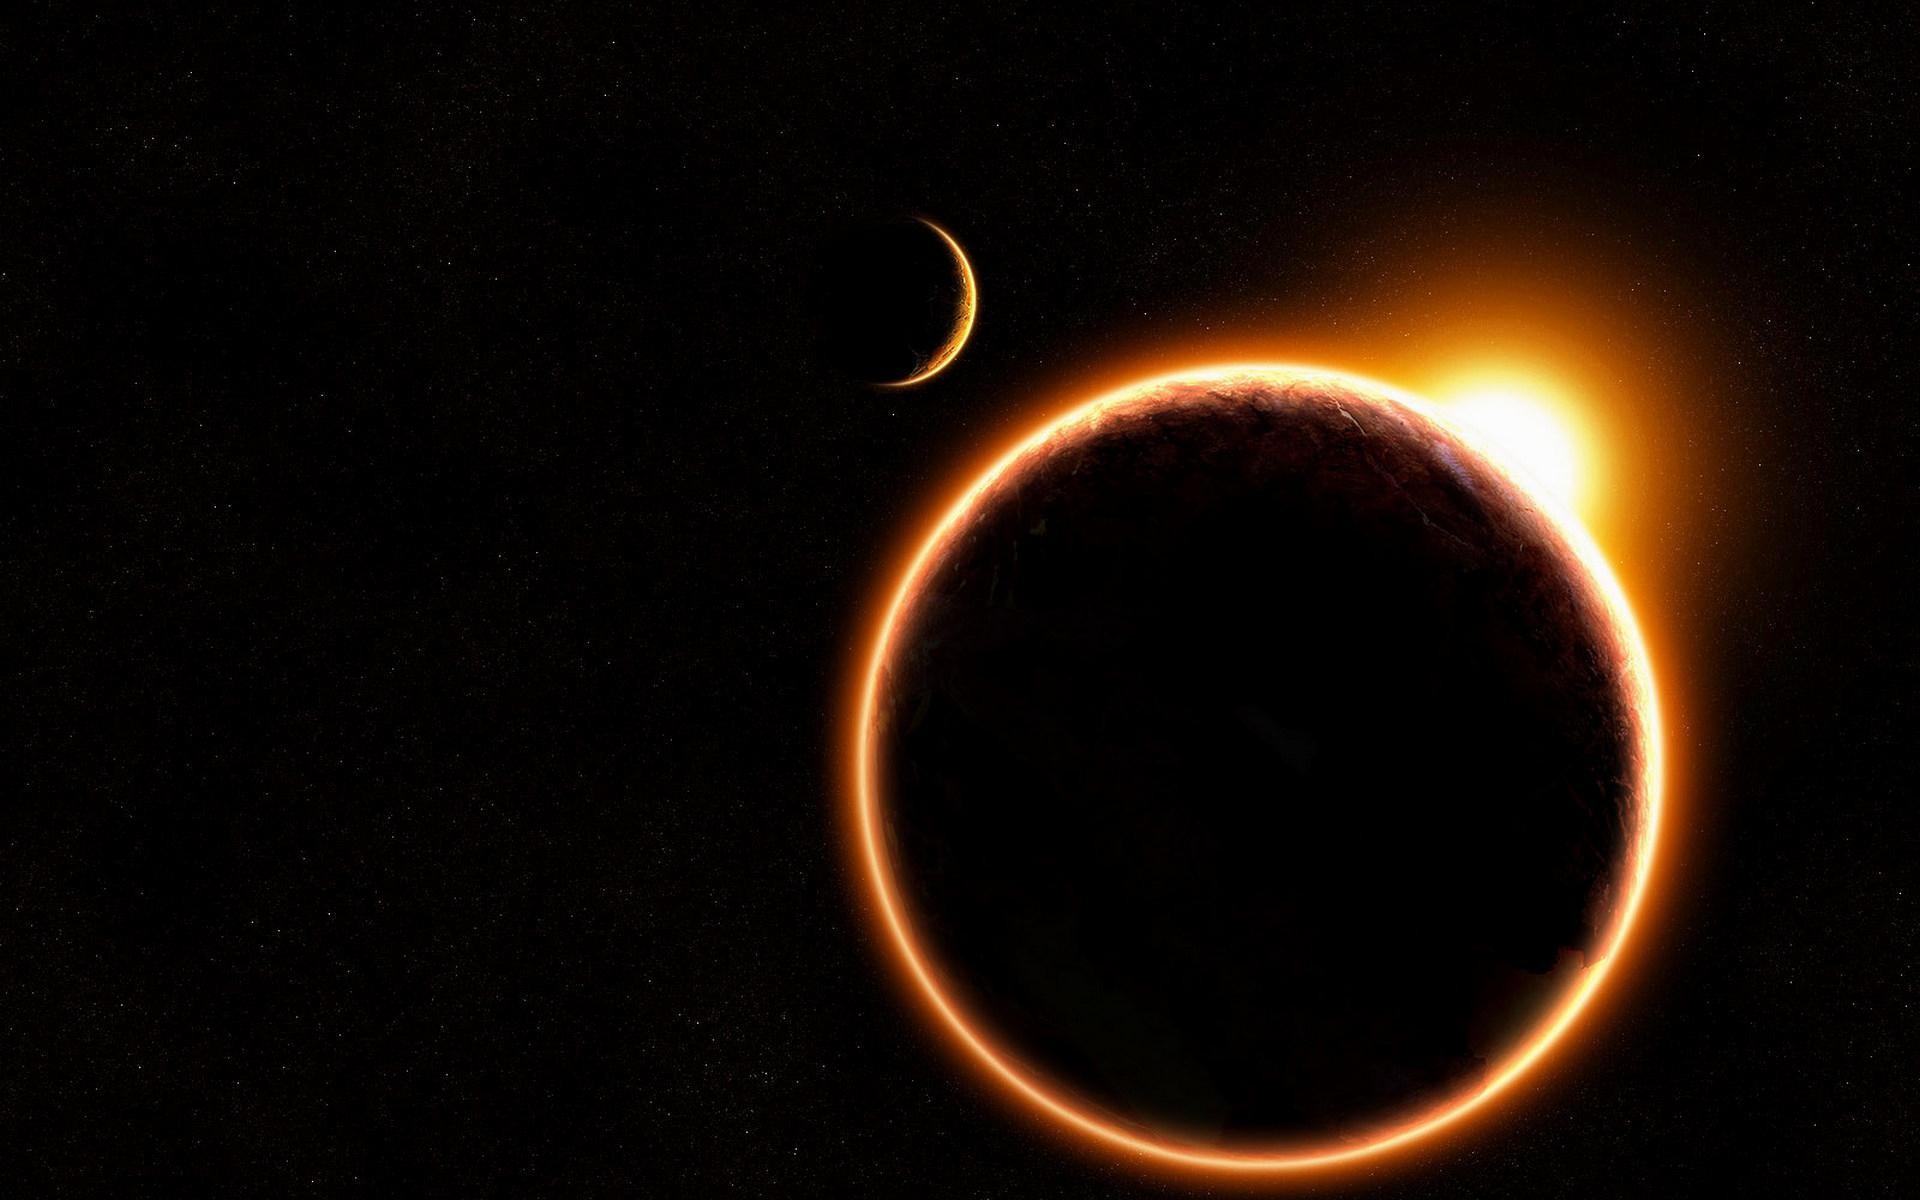 wallpaper.wiki-Sun-Moon-Stars-Image-Free-Download-